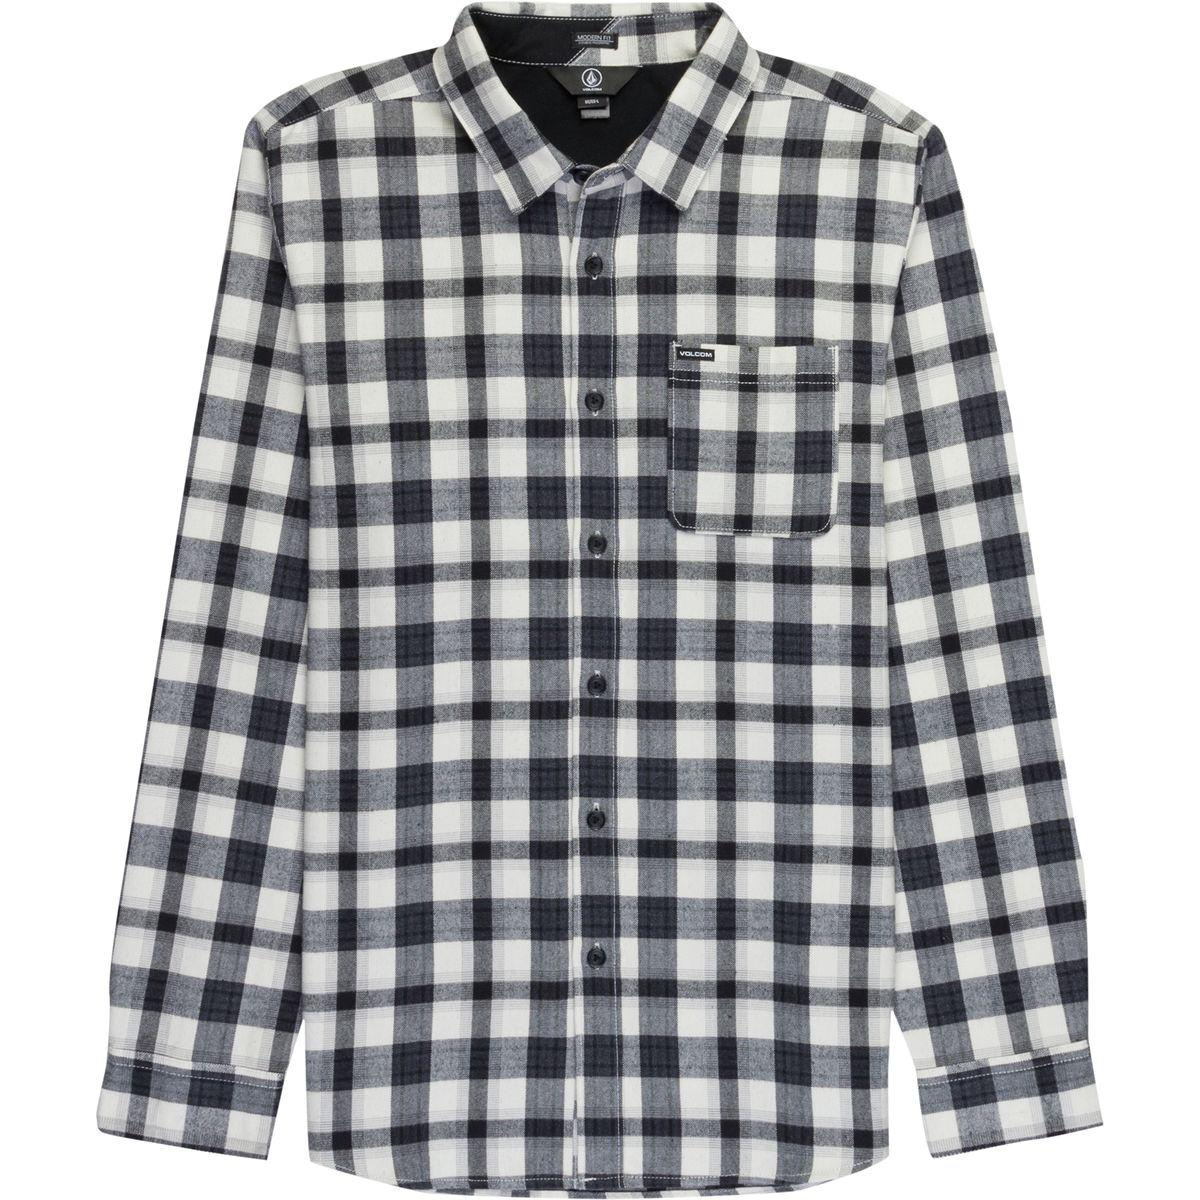 Lyst - Volcom Marcos Shirt for Men